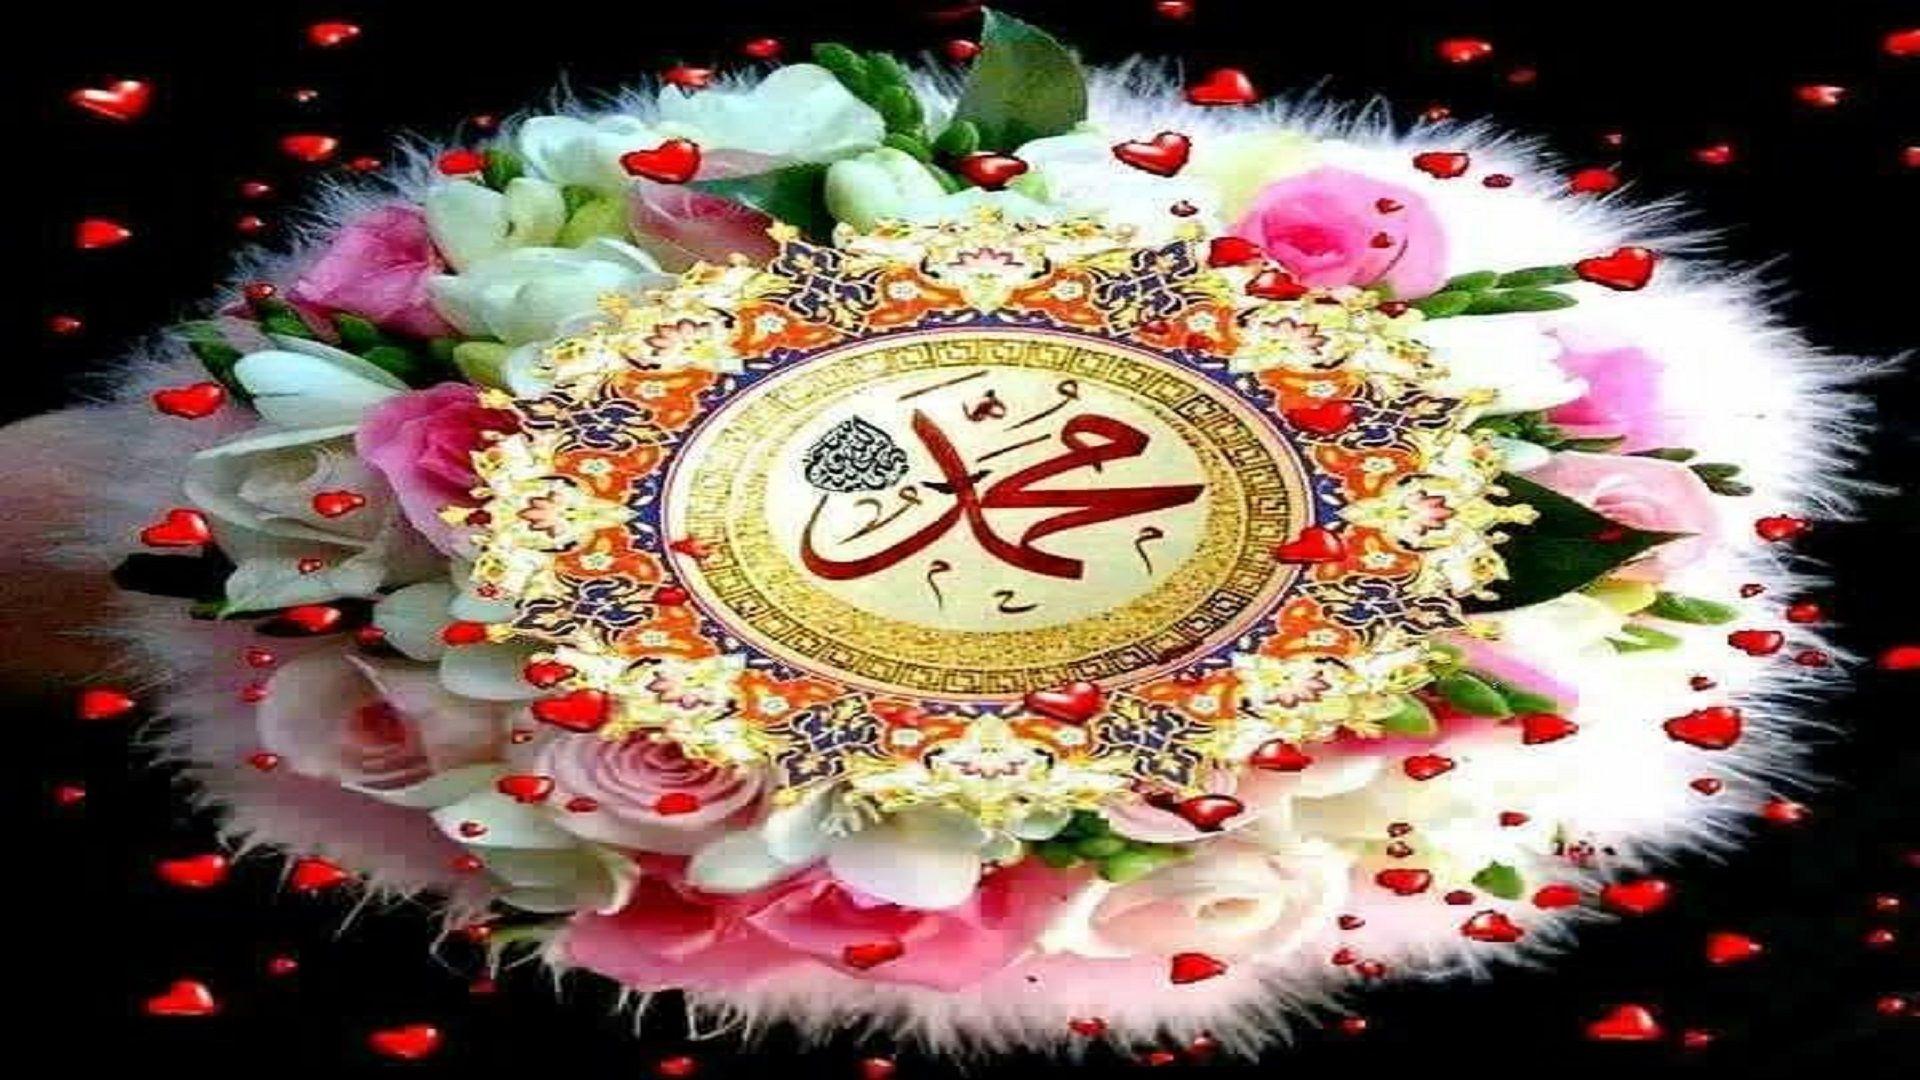 Allah Muhammad Wallpapers Hd Wallpaper Cave